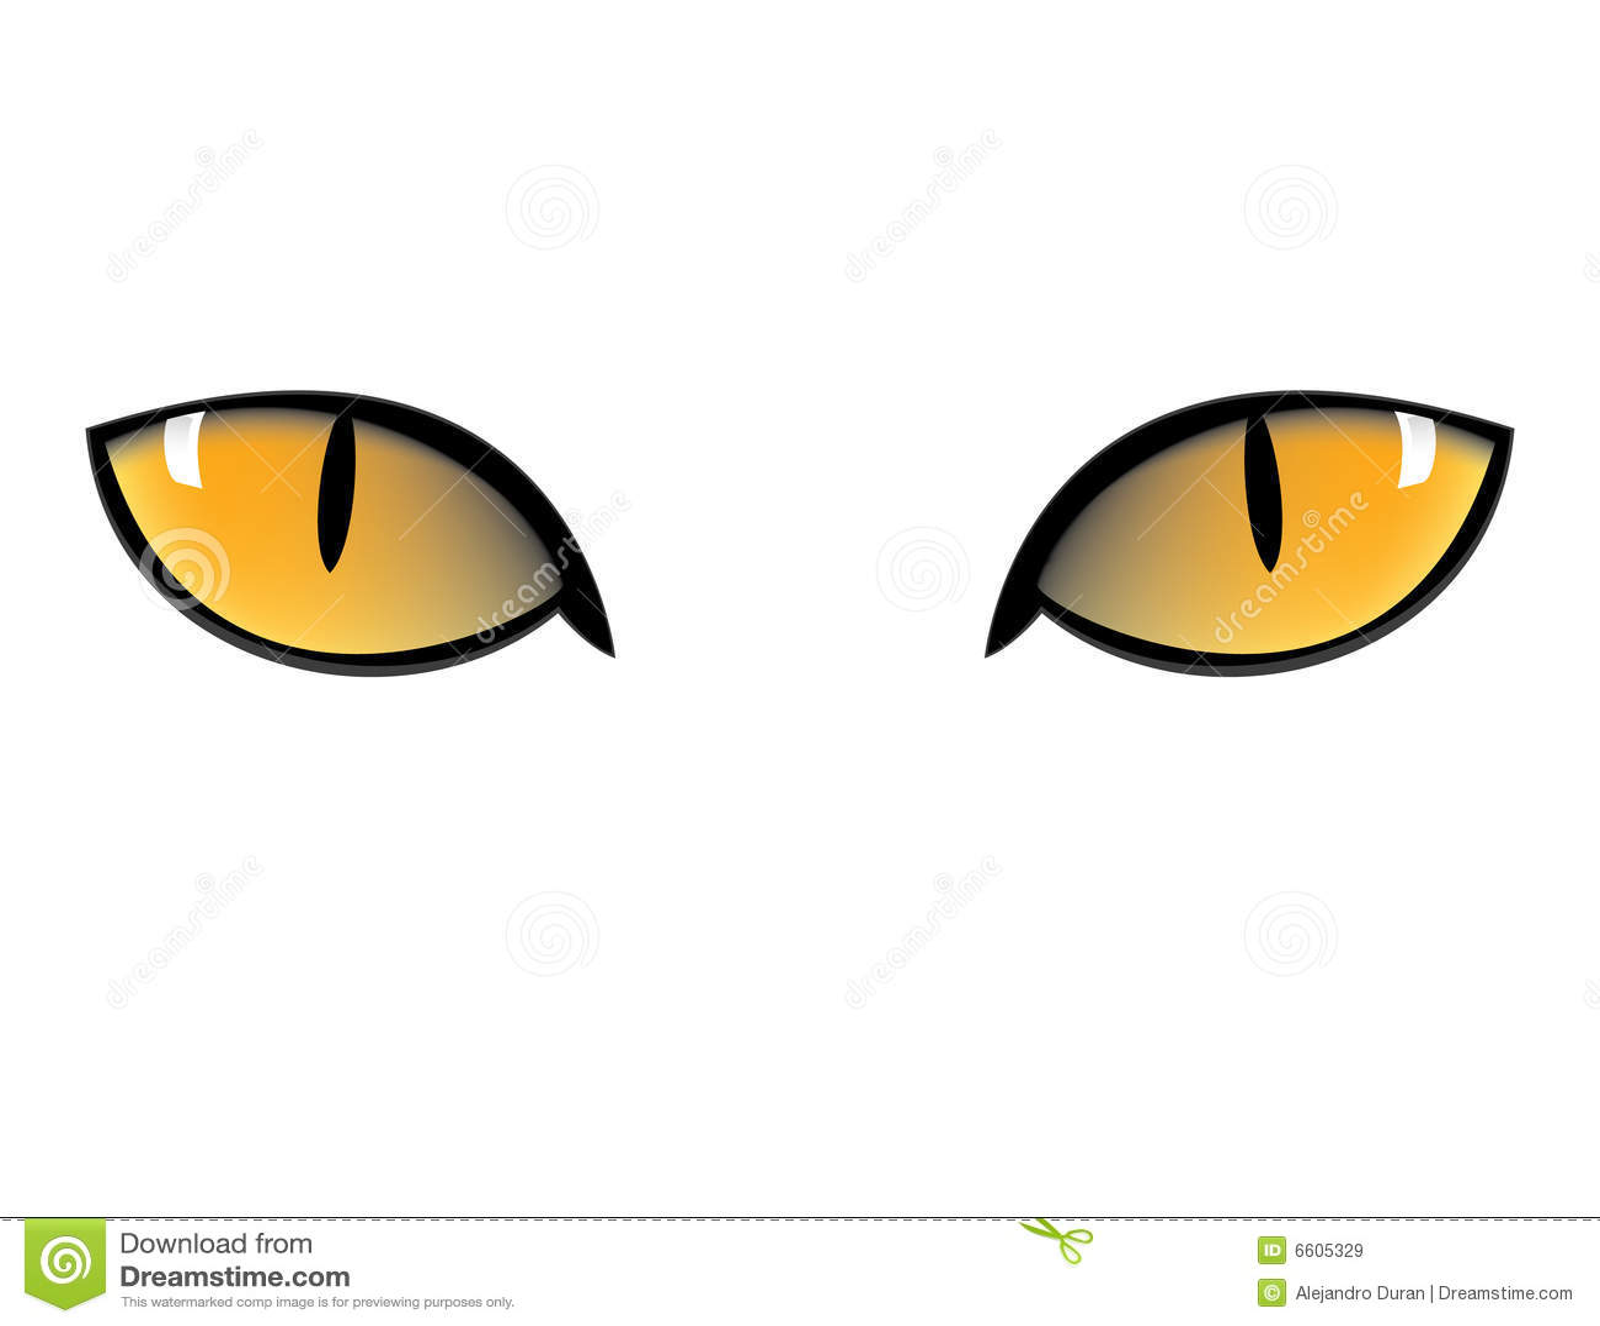 Cartoon Cat Eyes Nose